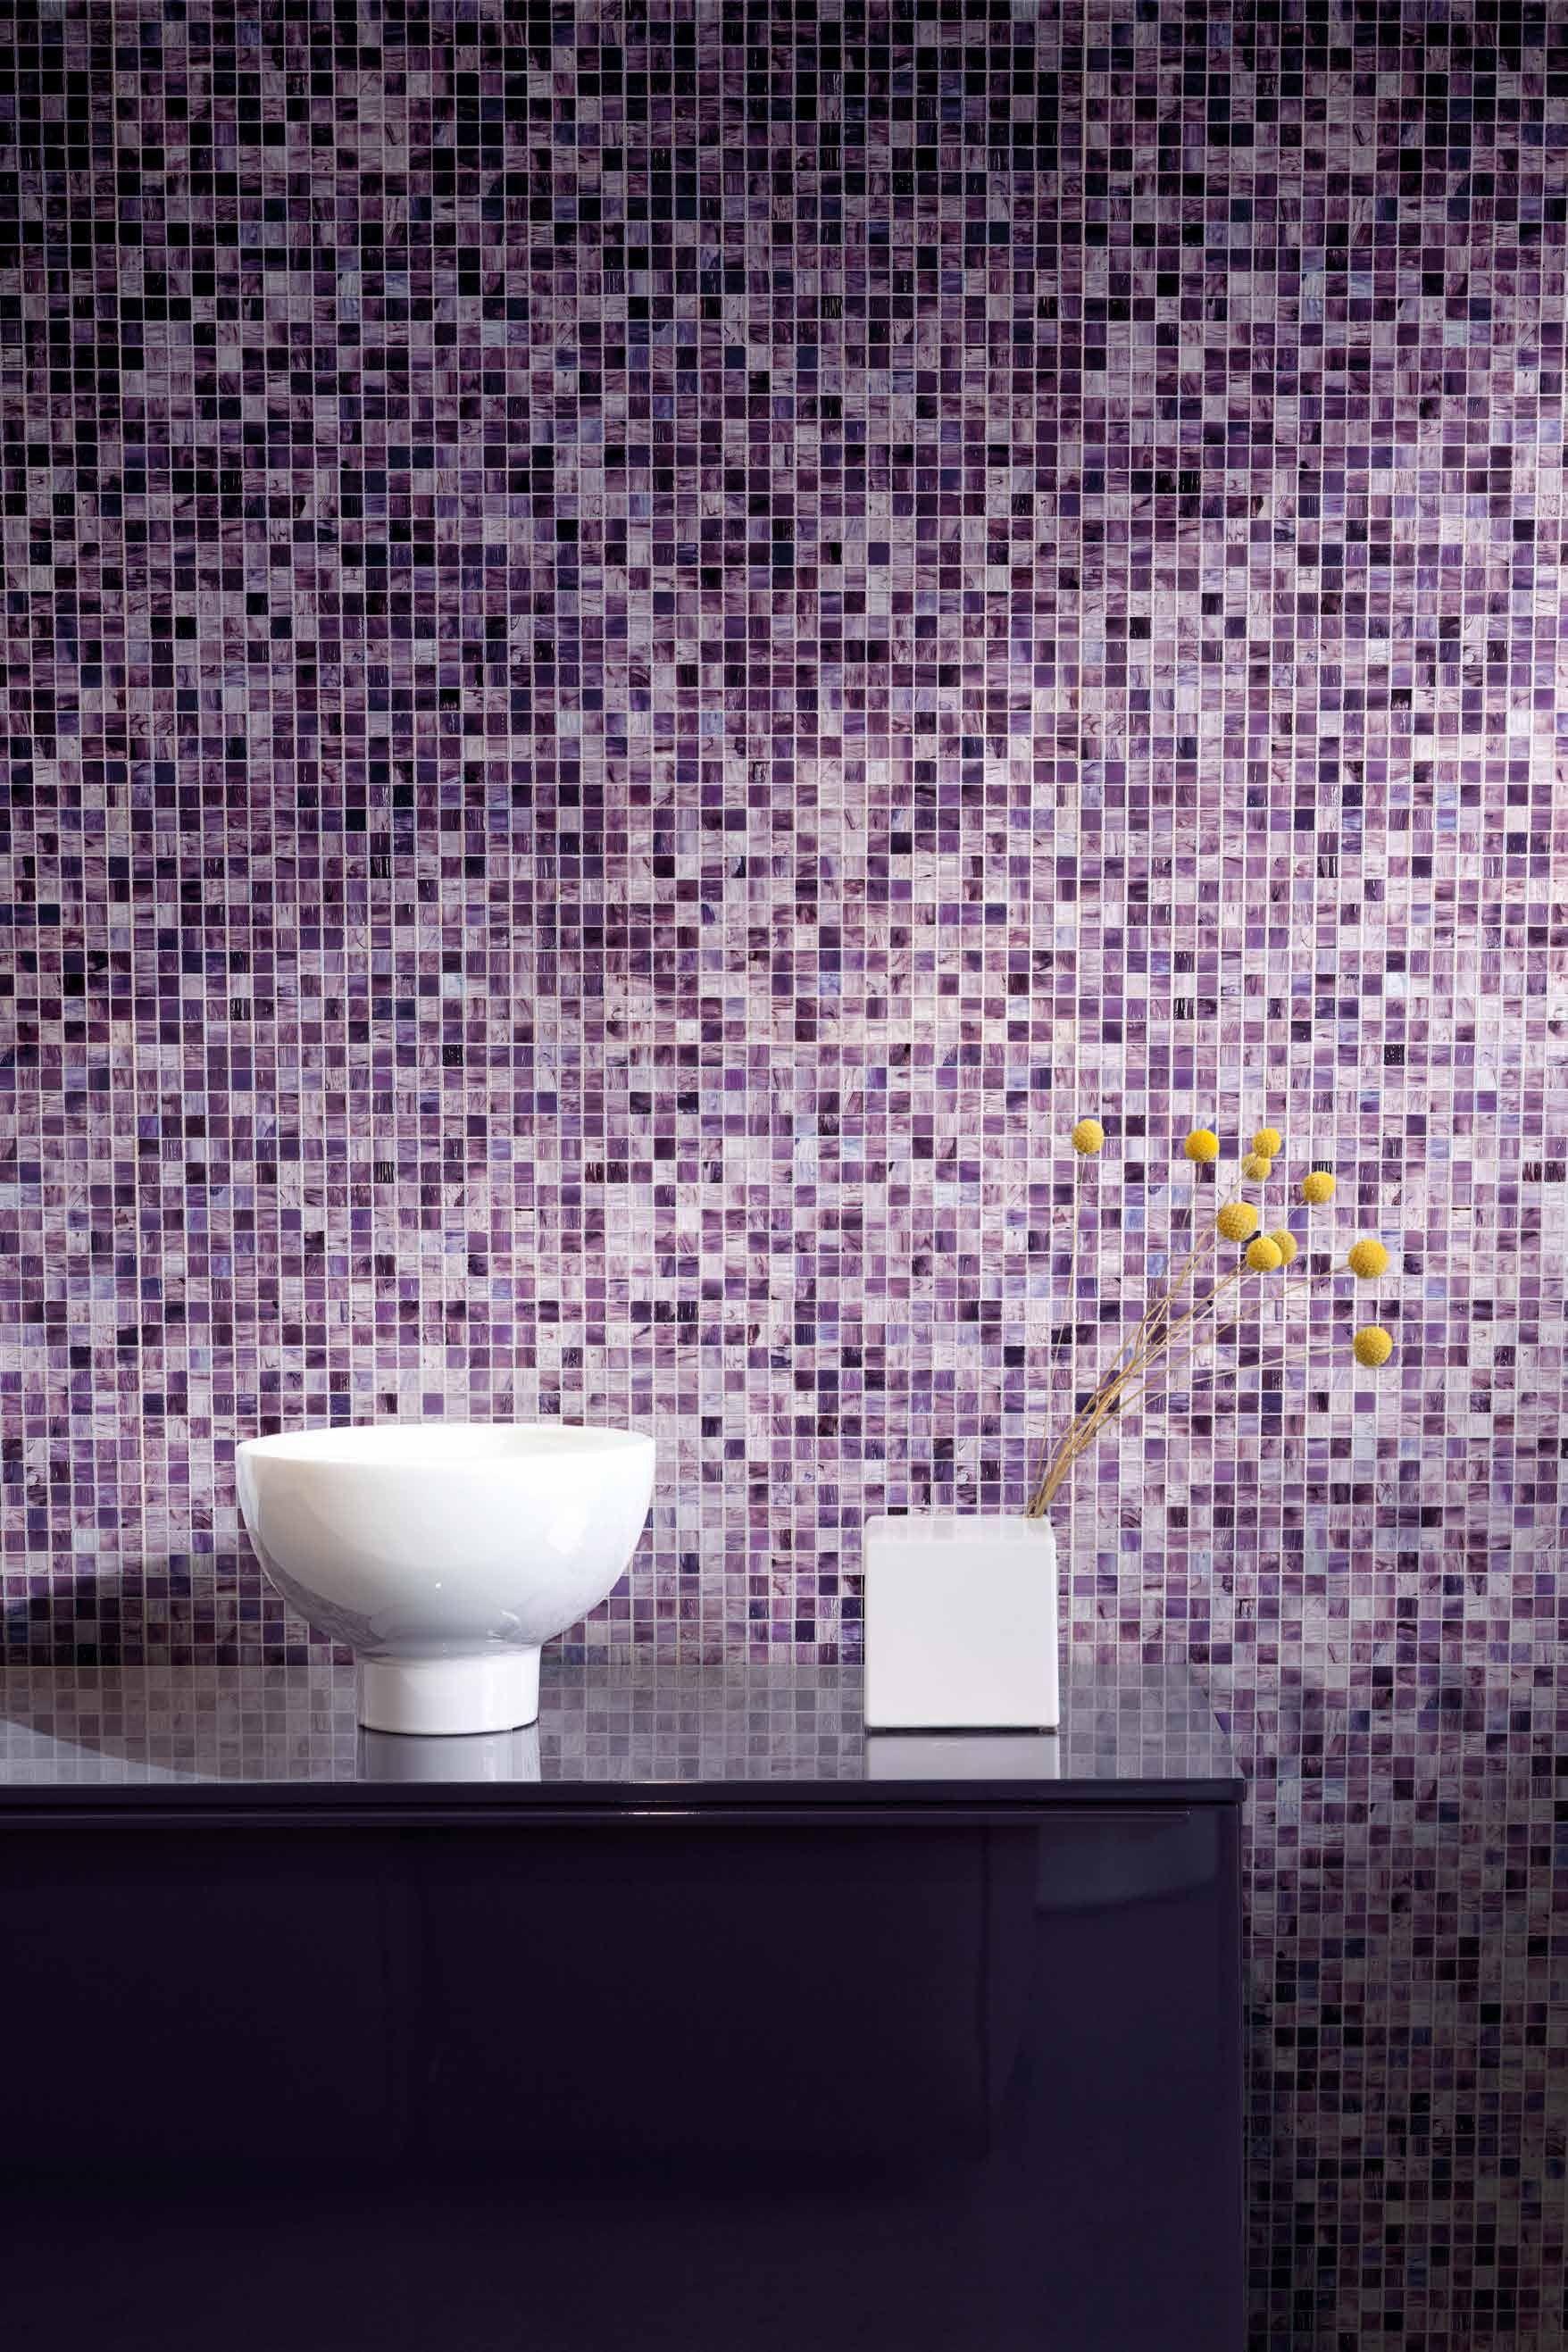 Piastrelle Bagno Mosaico Viola bisazza opera gloss 1,5x1,5 cm op 15.08 gloss | modernes